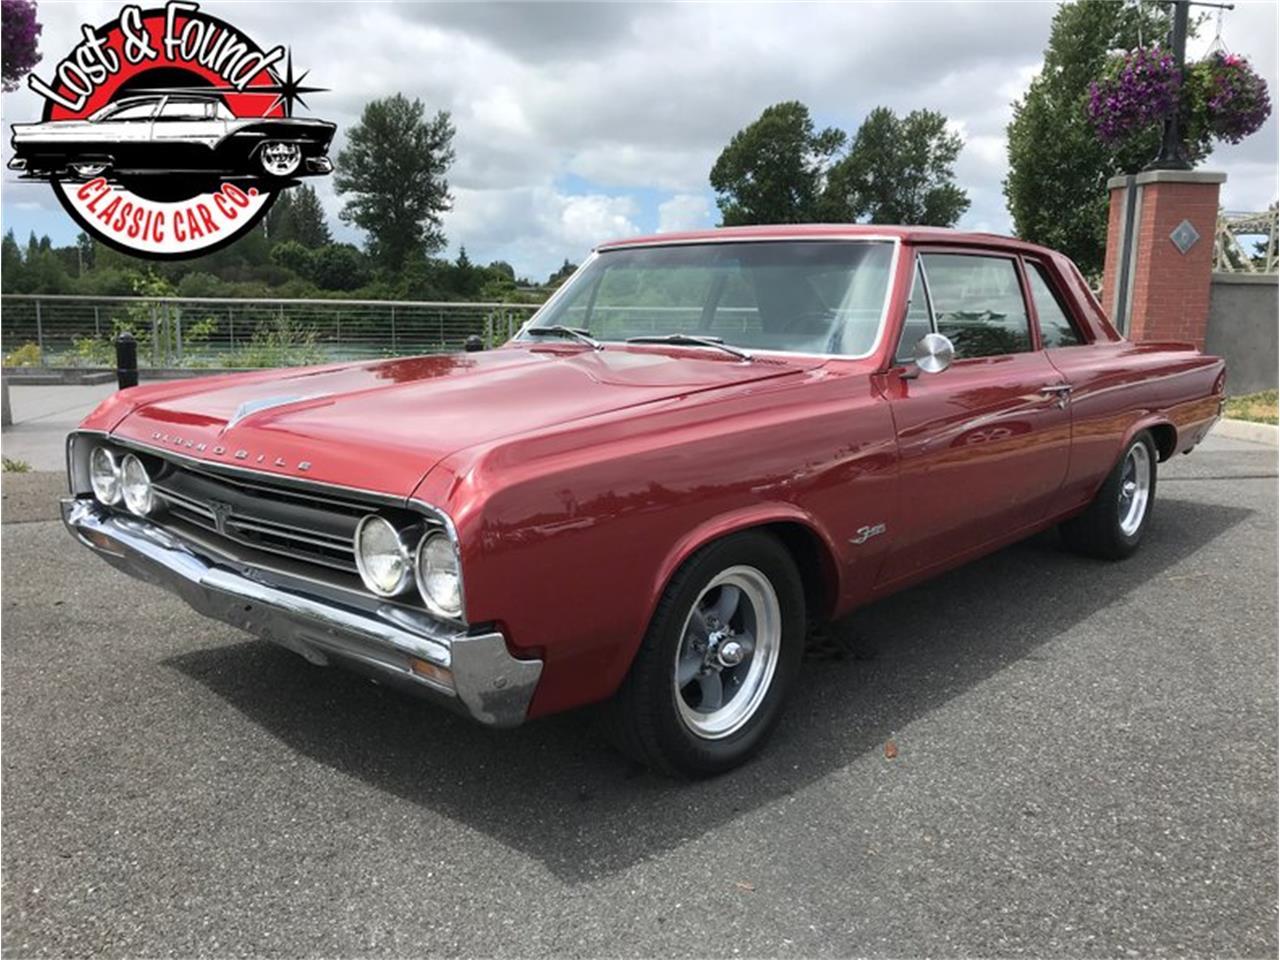 For Sale: 1964 Oldsmobile Cutlass in Mount Vernon, Washington